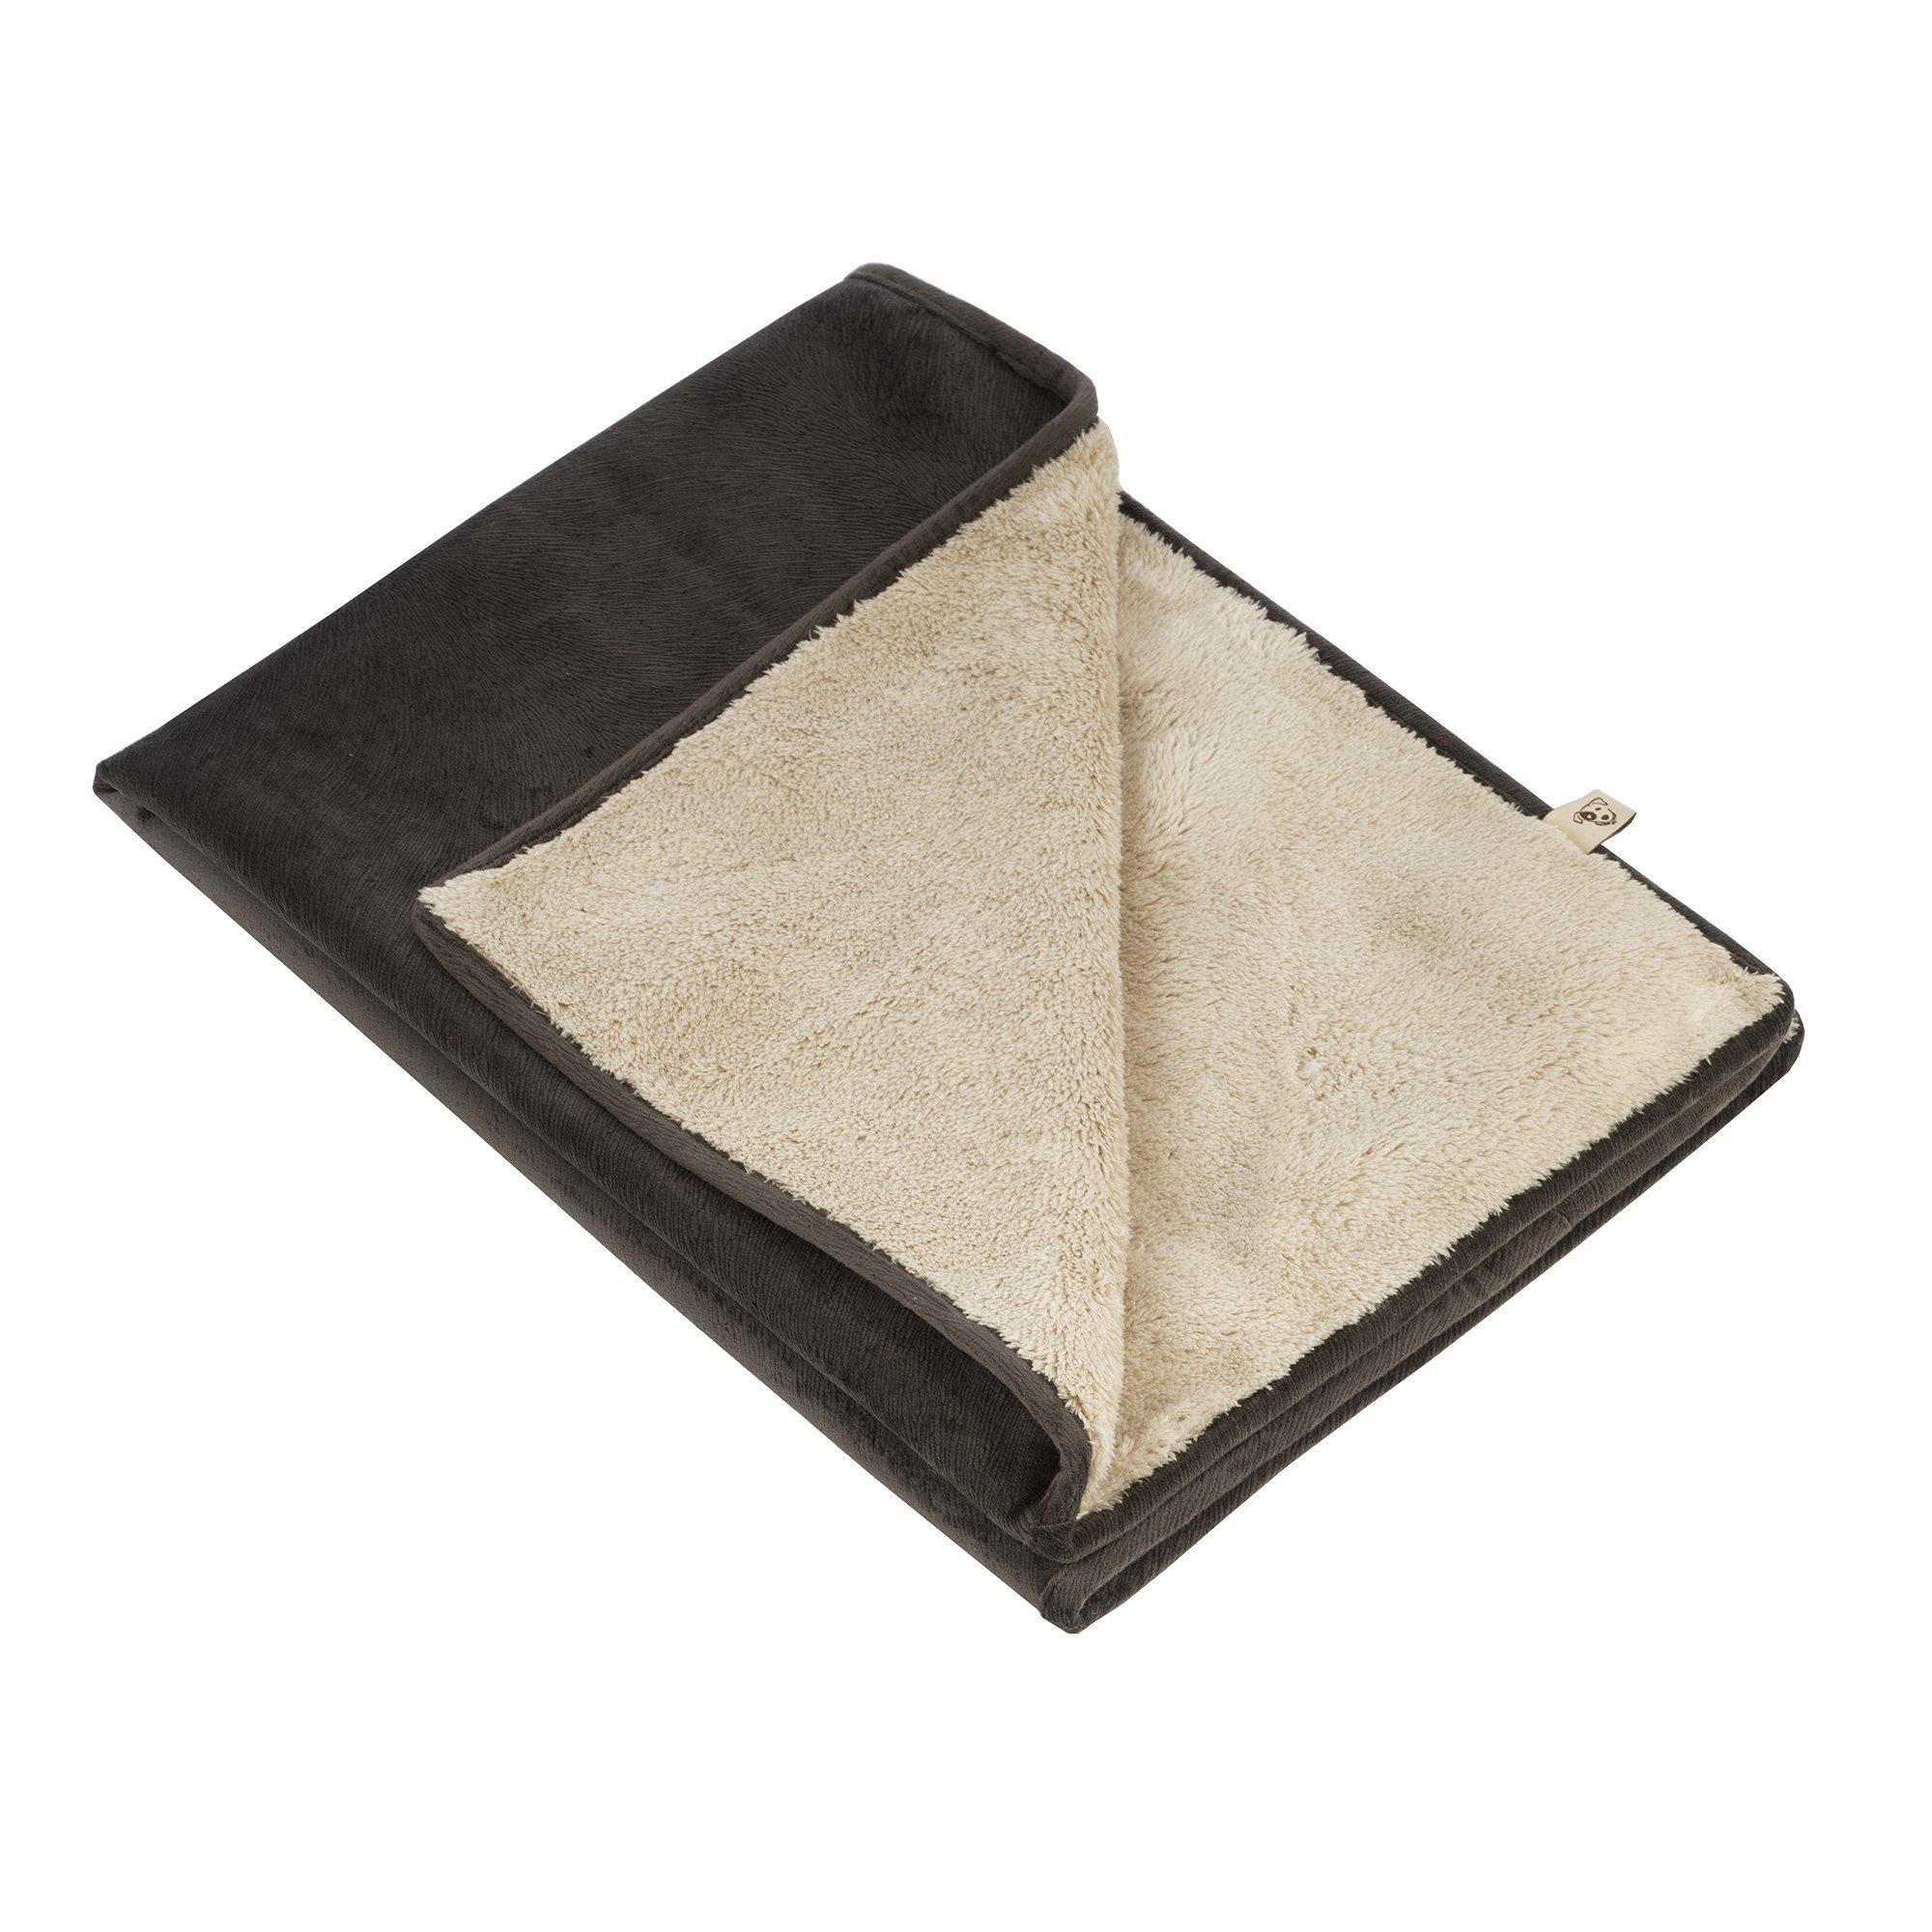 Jax and Bones Coal Fur Velour Standard Pet Blanket, Small